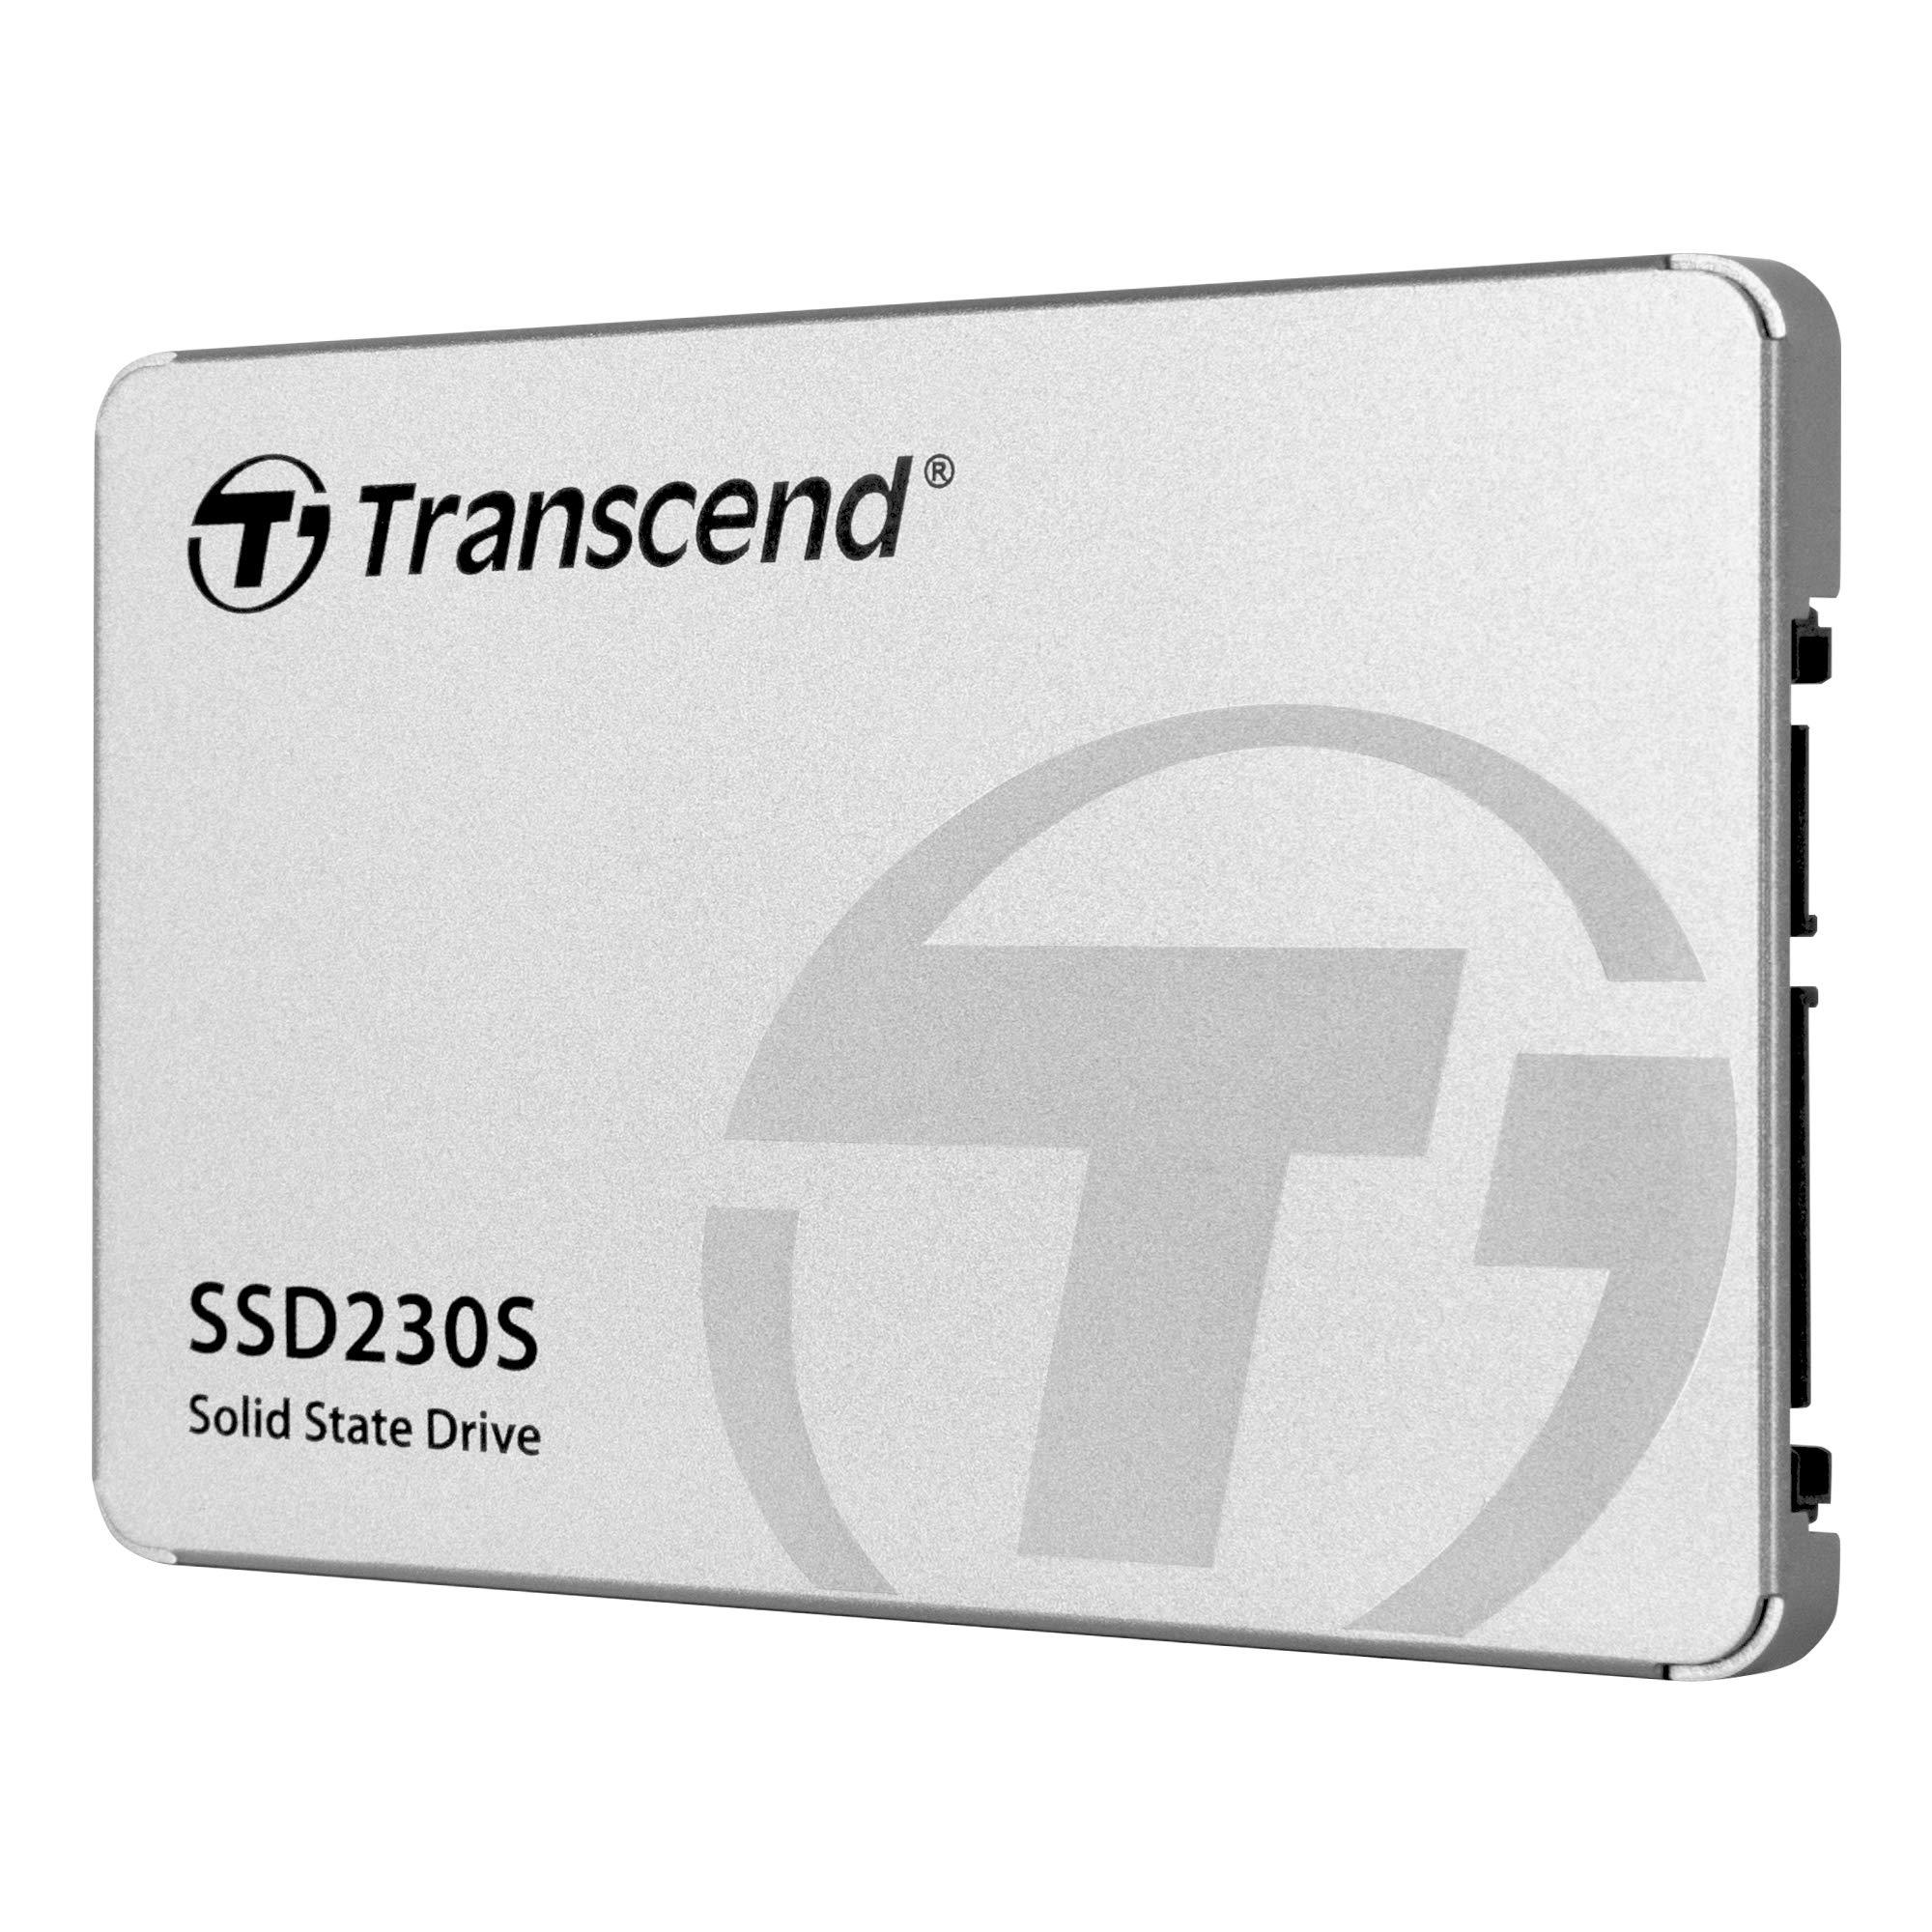 "Transcend 256GB SATA III 6Gb/s SSD230S 2.5"" Solid State Drive TS256GSSD230S,Silver"